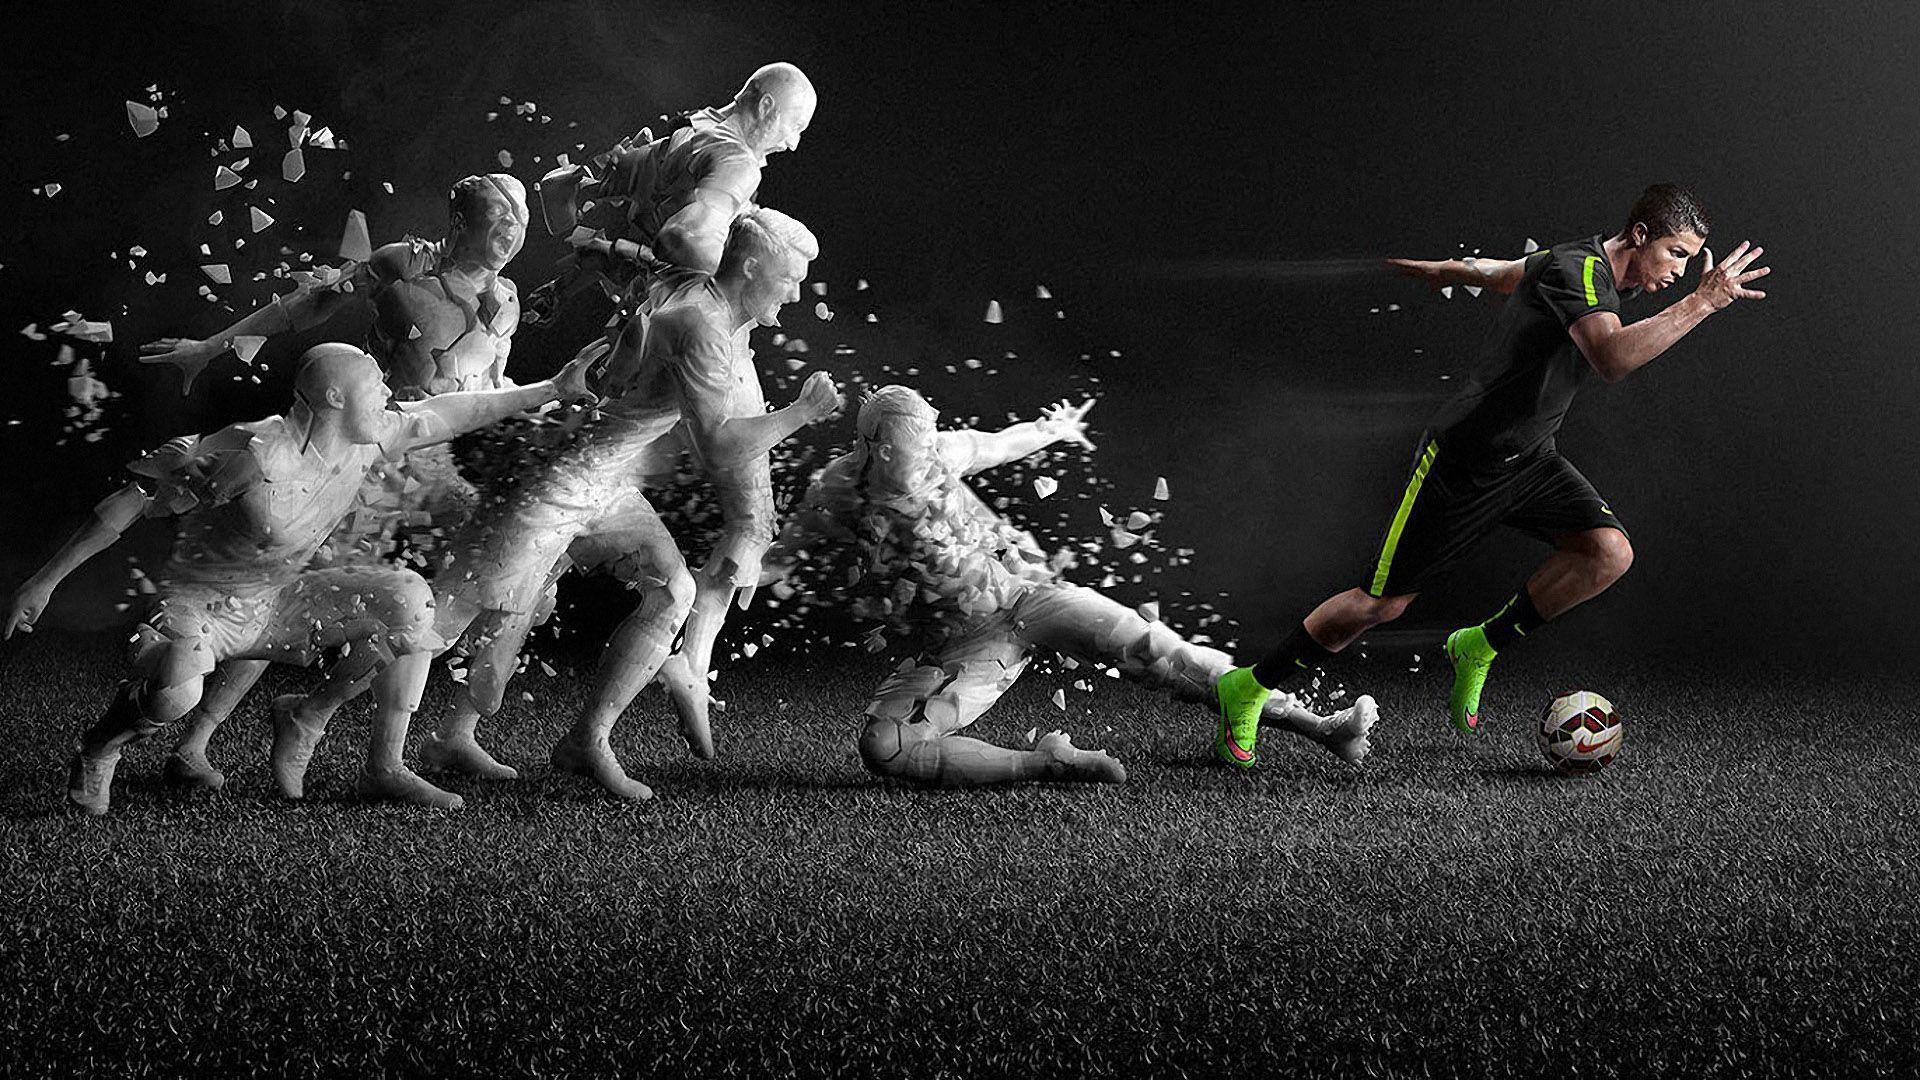 Cristiano Ronaldo Wallpapers 2016 Nike 1920x1080